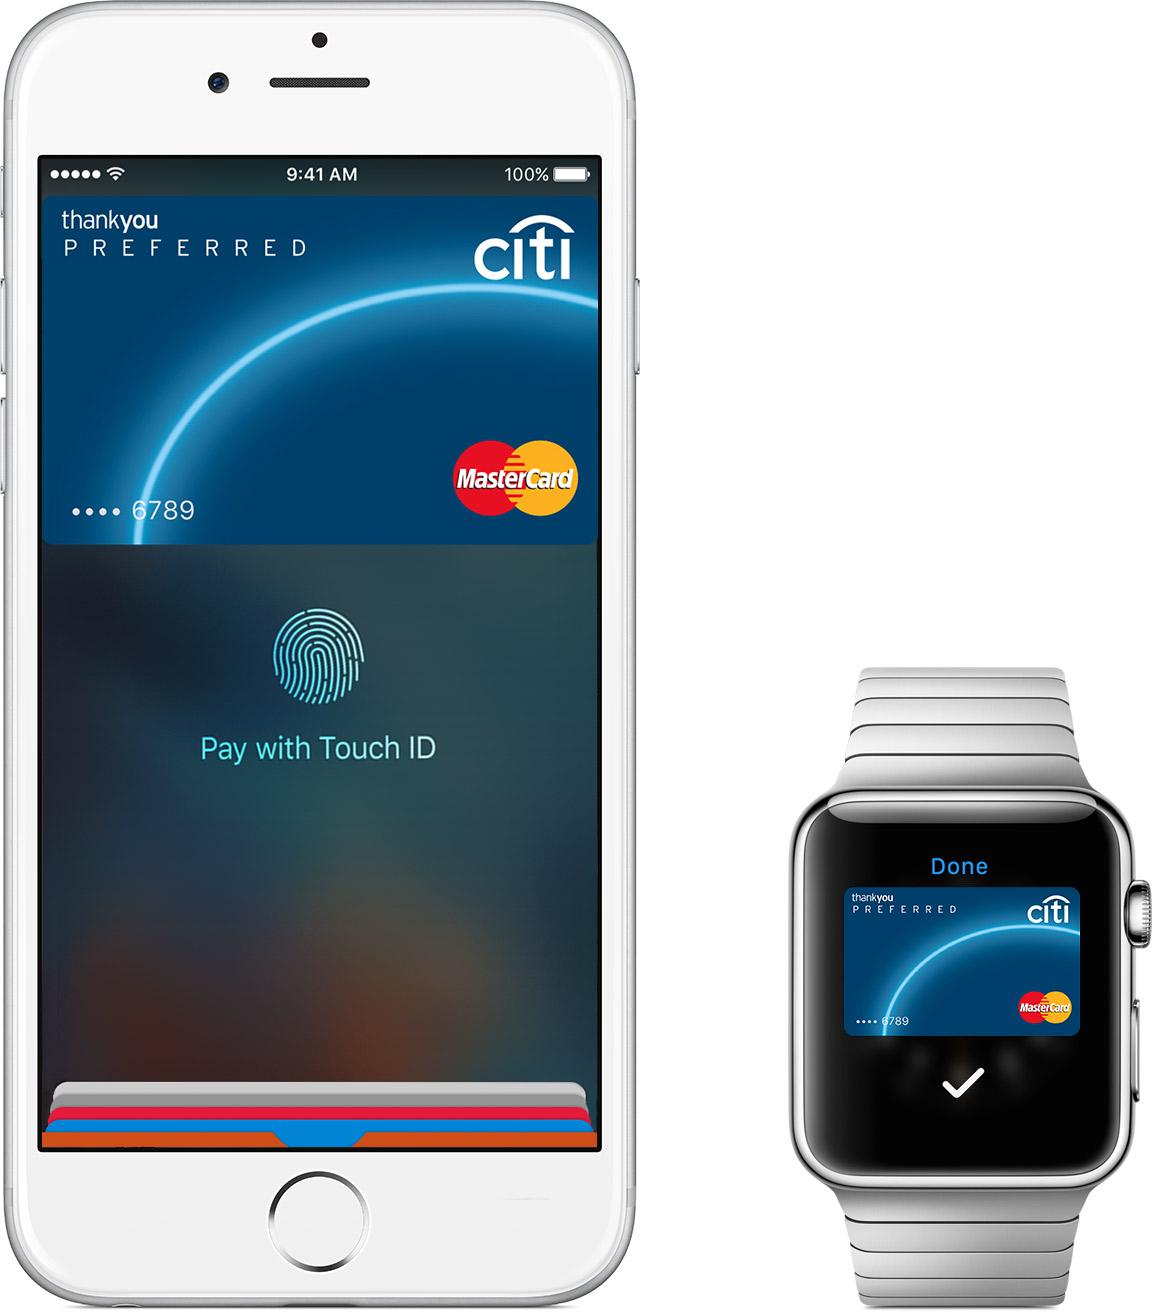 iphone6-ios9-watch-applepay-stores-apps-demi-hero-alt